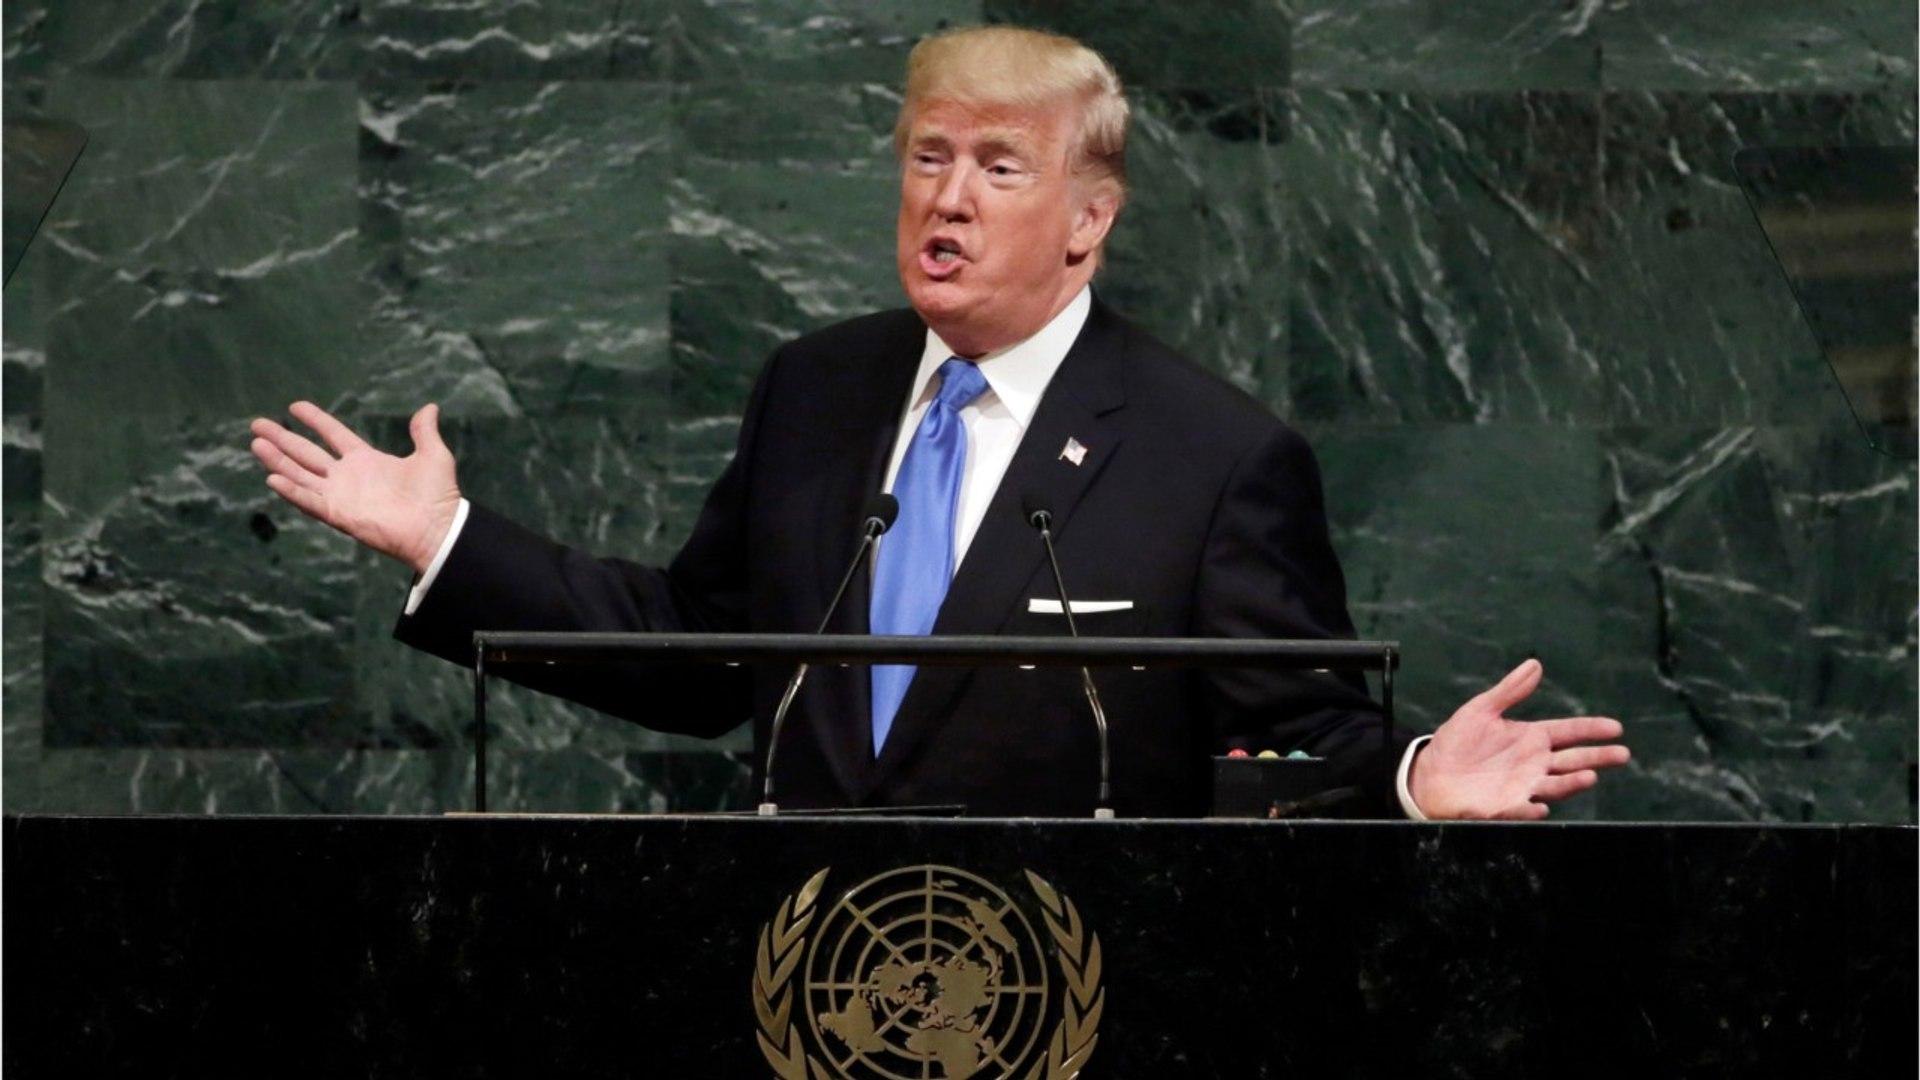 President Trump Threatens North Korea Via Twitter